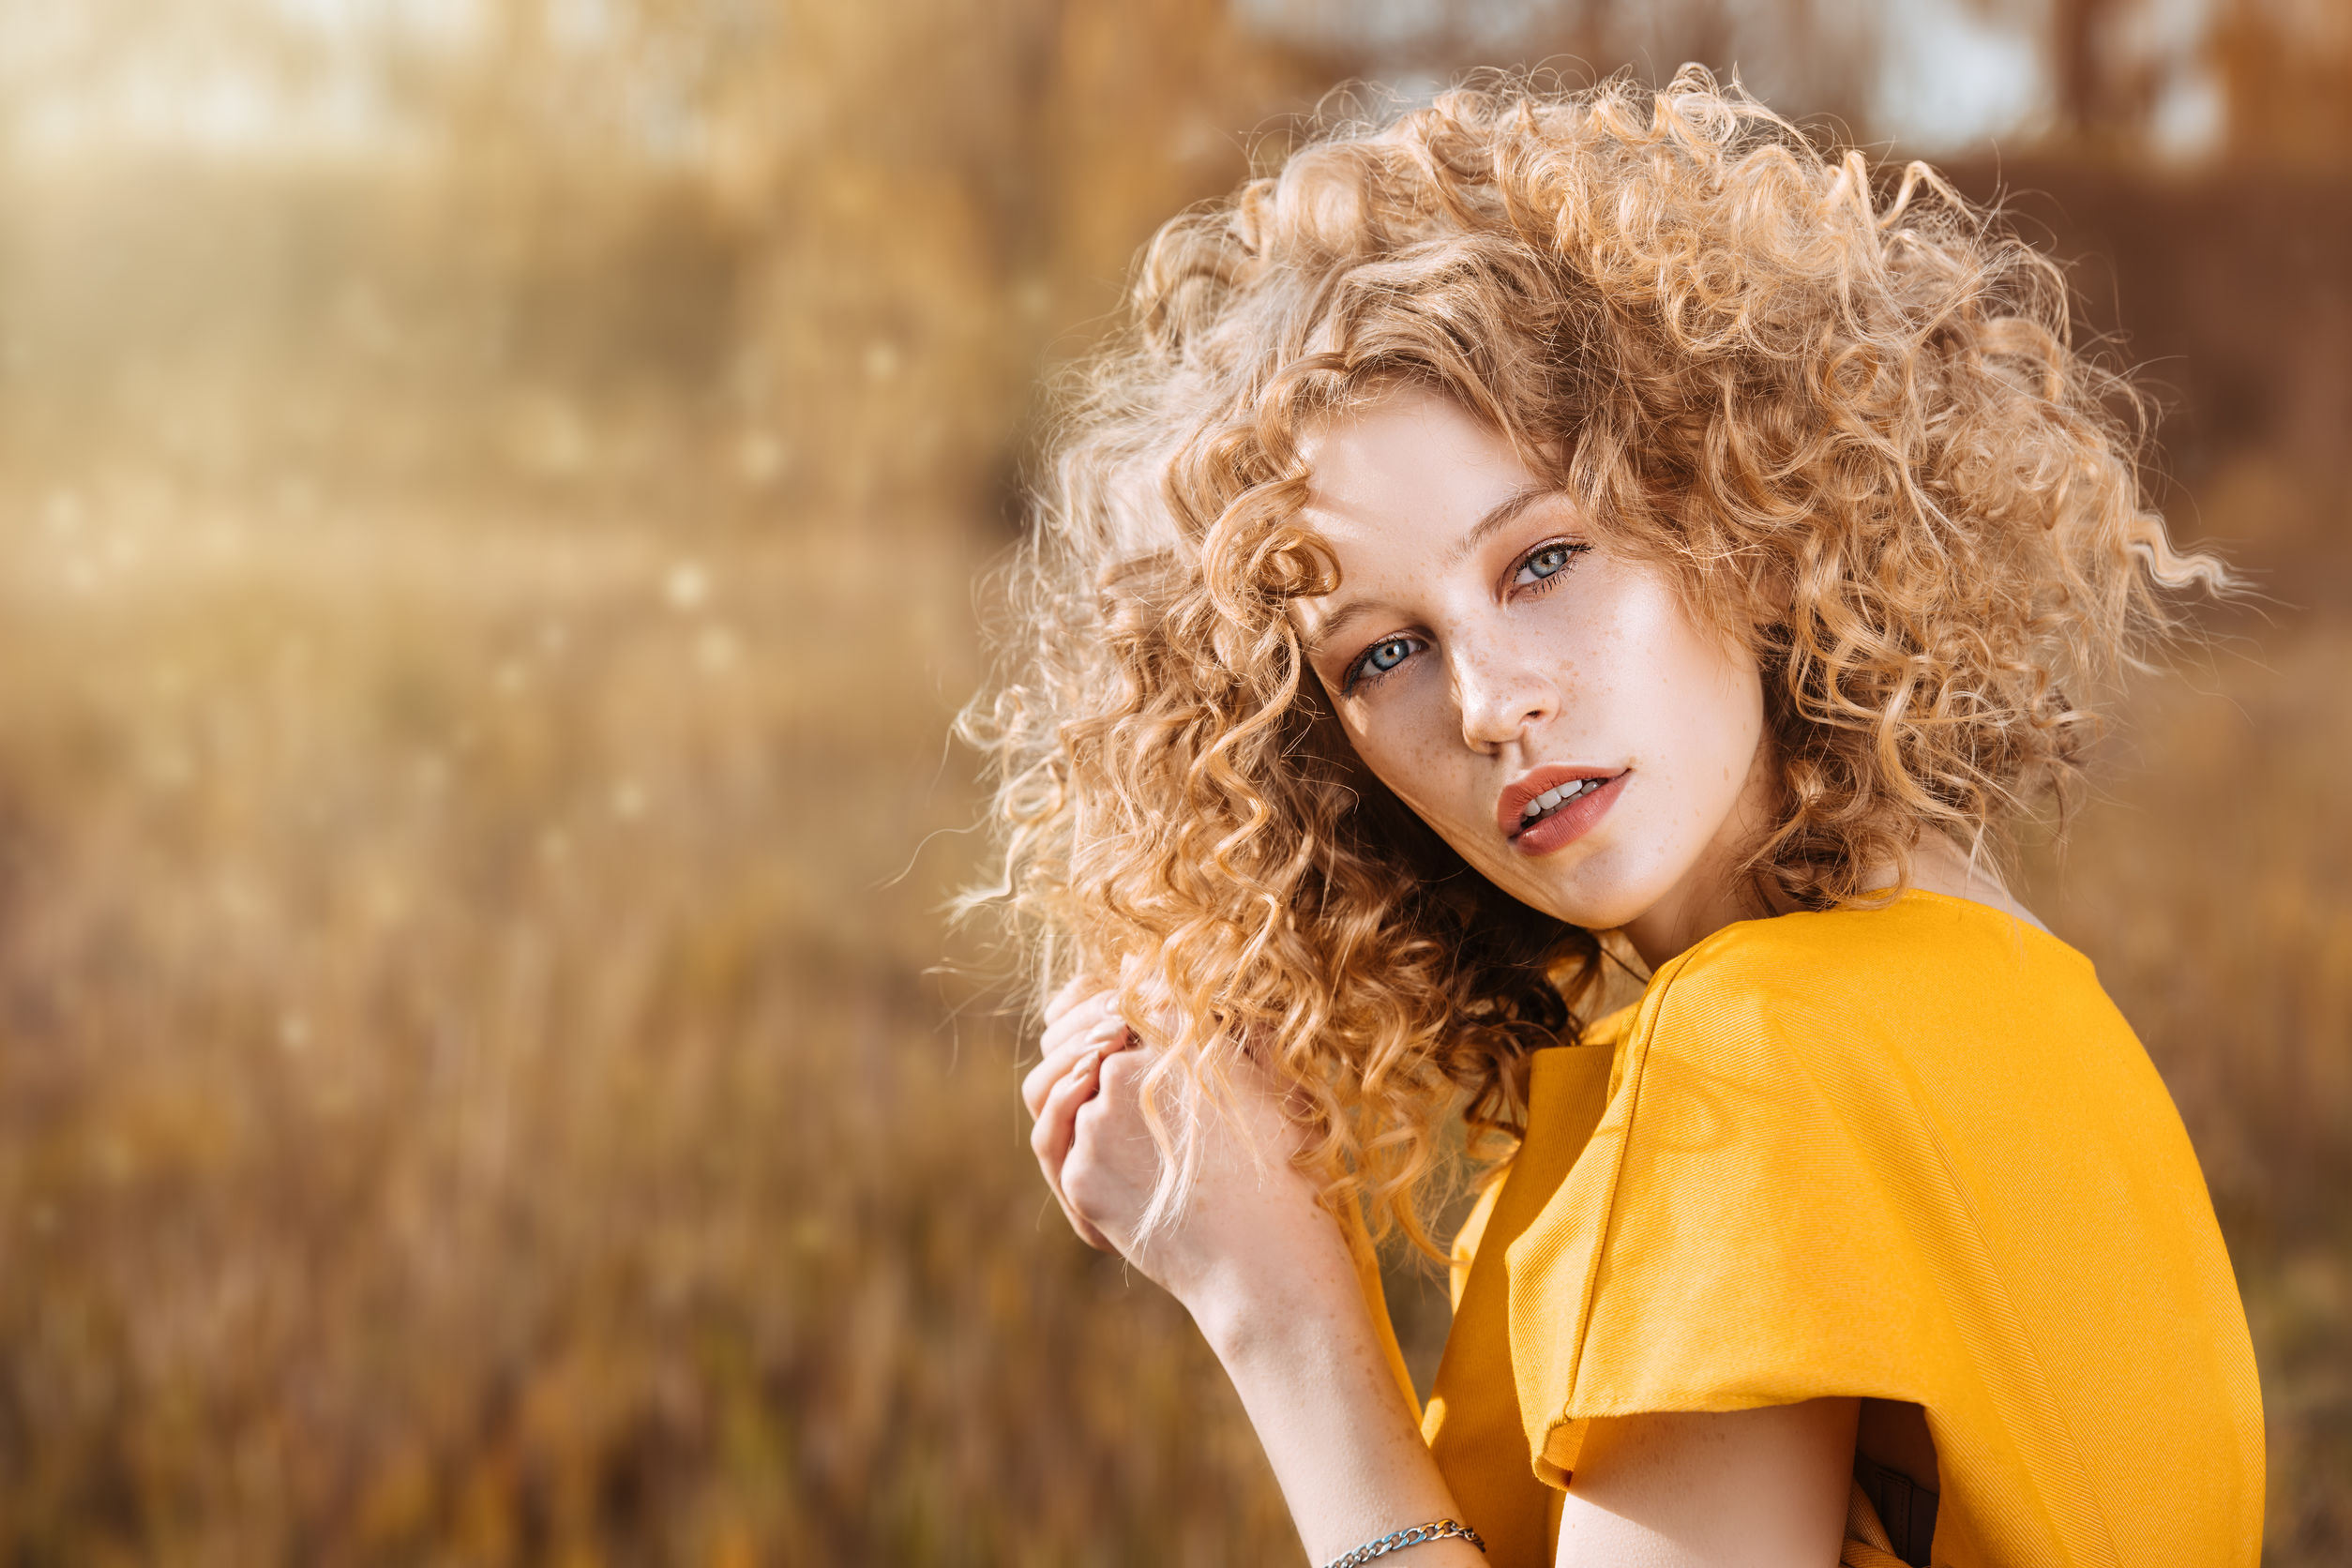 imagen de mujer rubia de cabello rizado